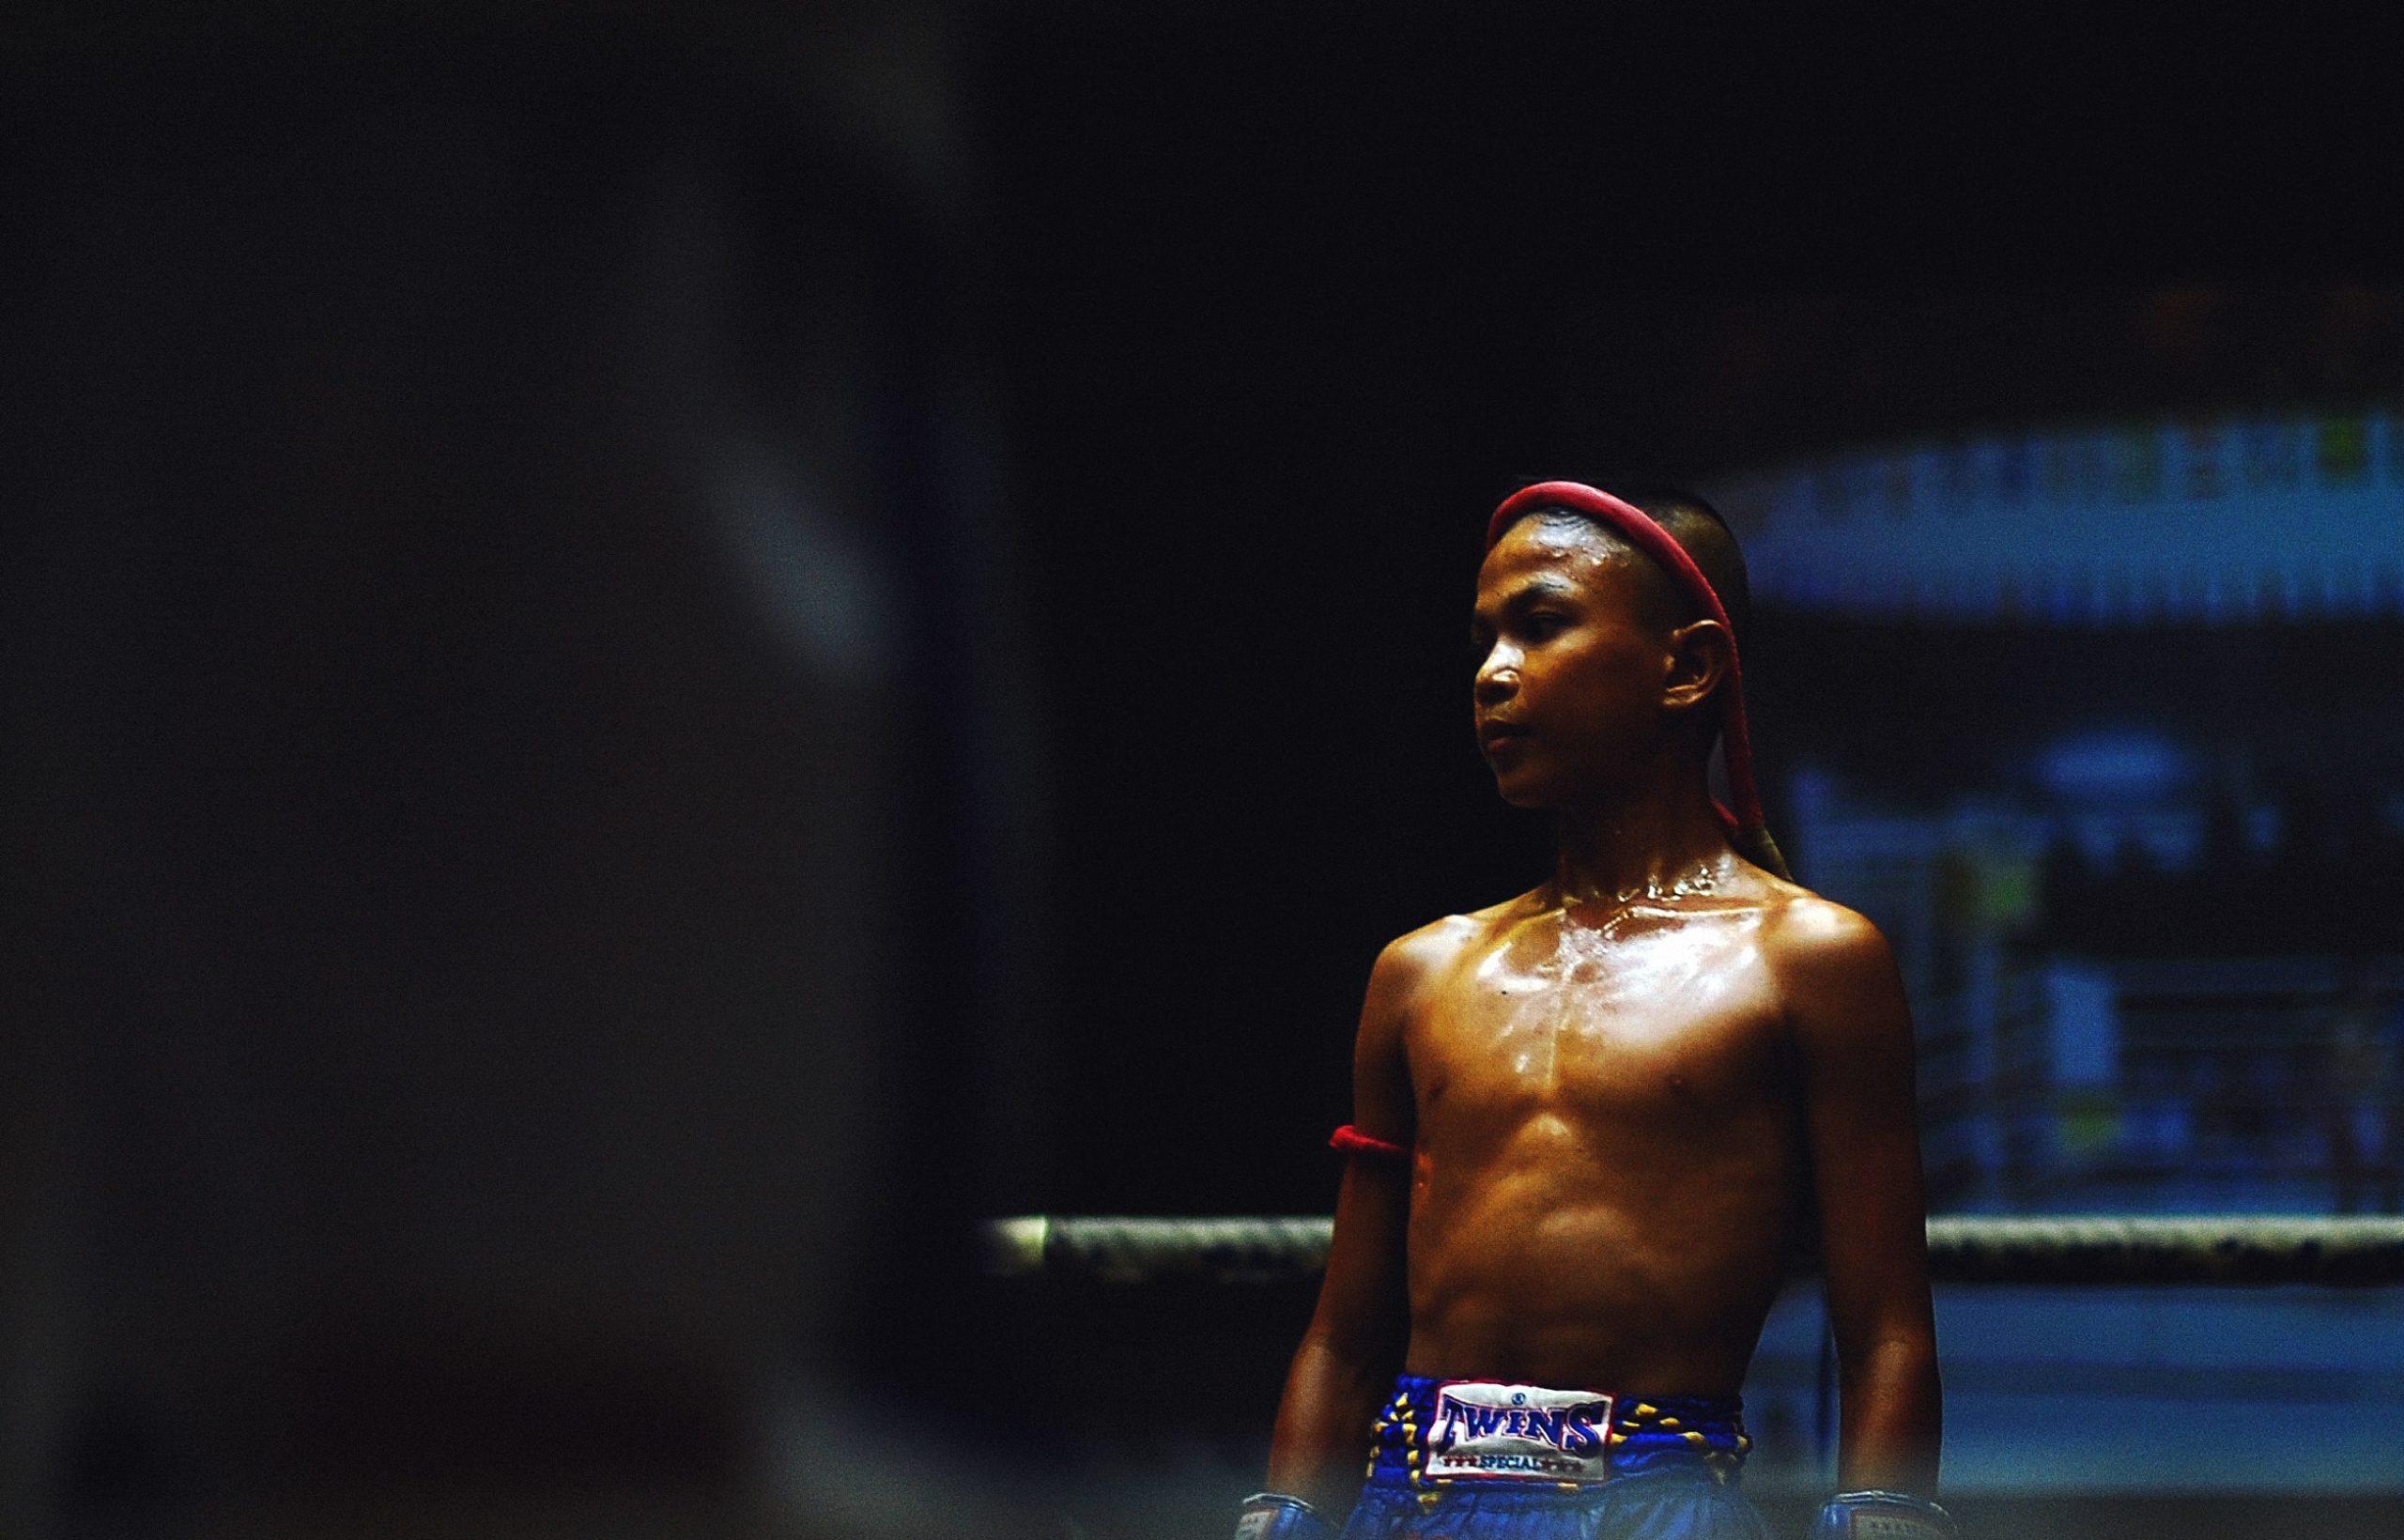 Muay thai ou Boxe thailandaise